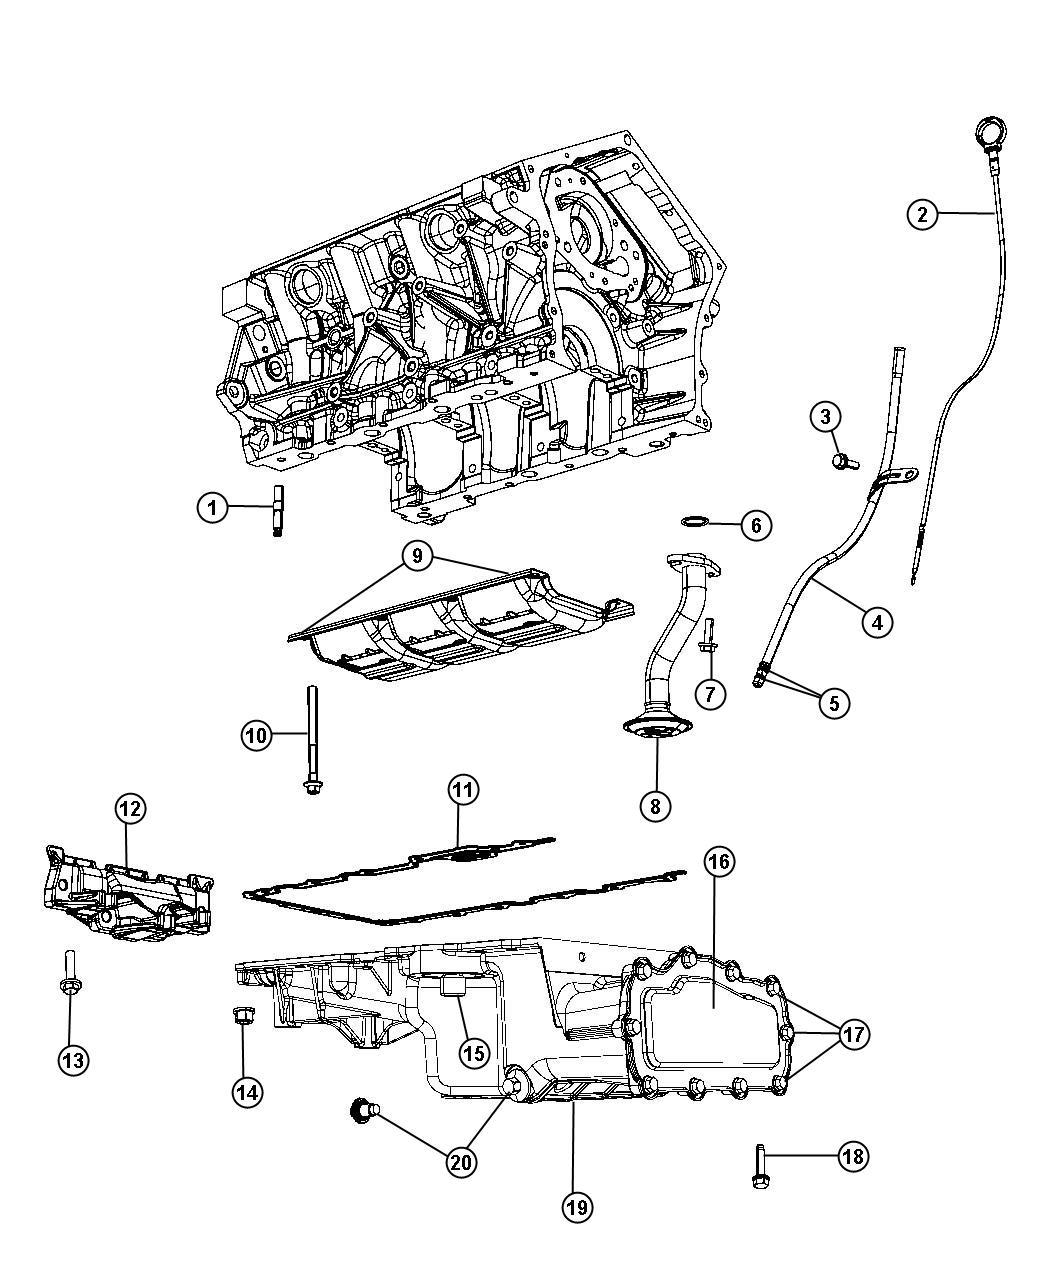 Chrysler Engine Diagrams